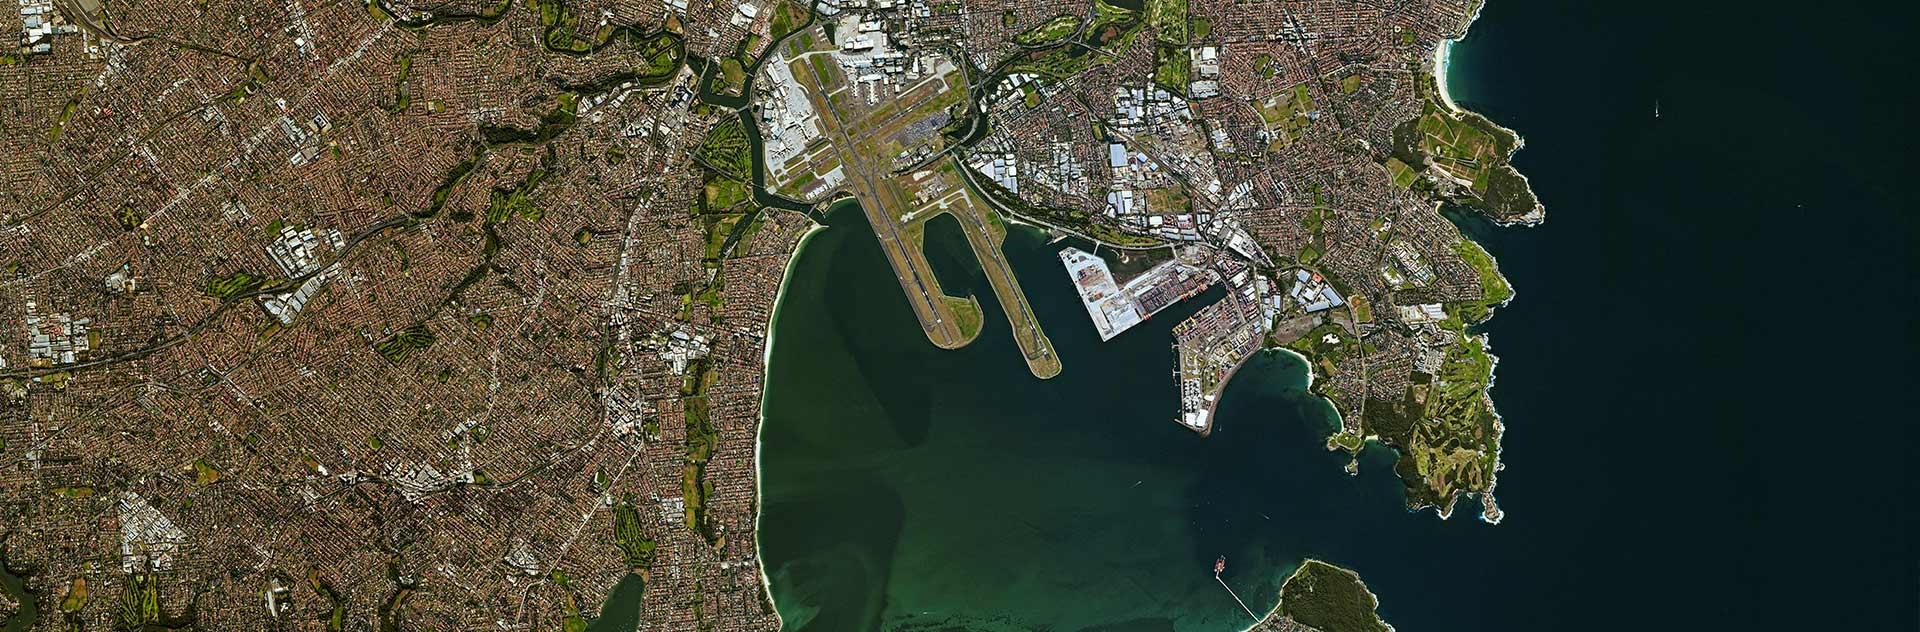 SPOT 7 optical satellite image of Sydney, Australia